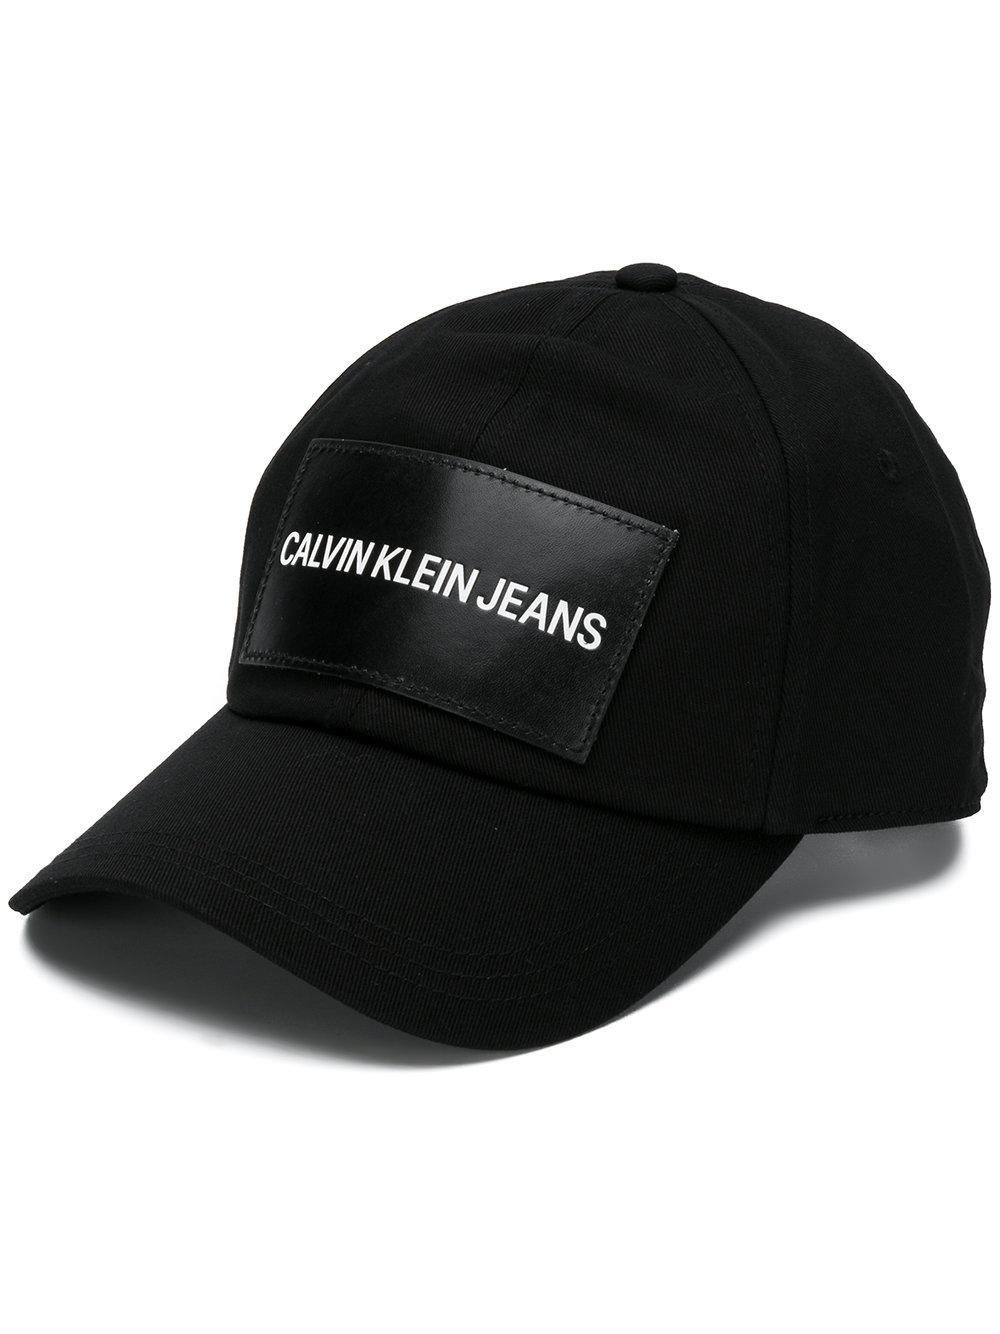 7f9299aab0536 Calvin Klein Jeans Logo Patch Cap